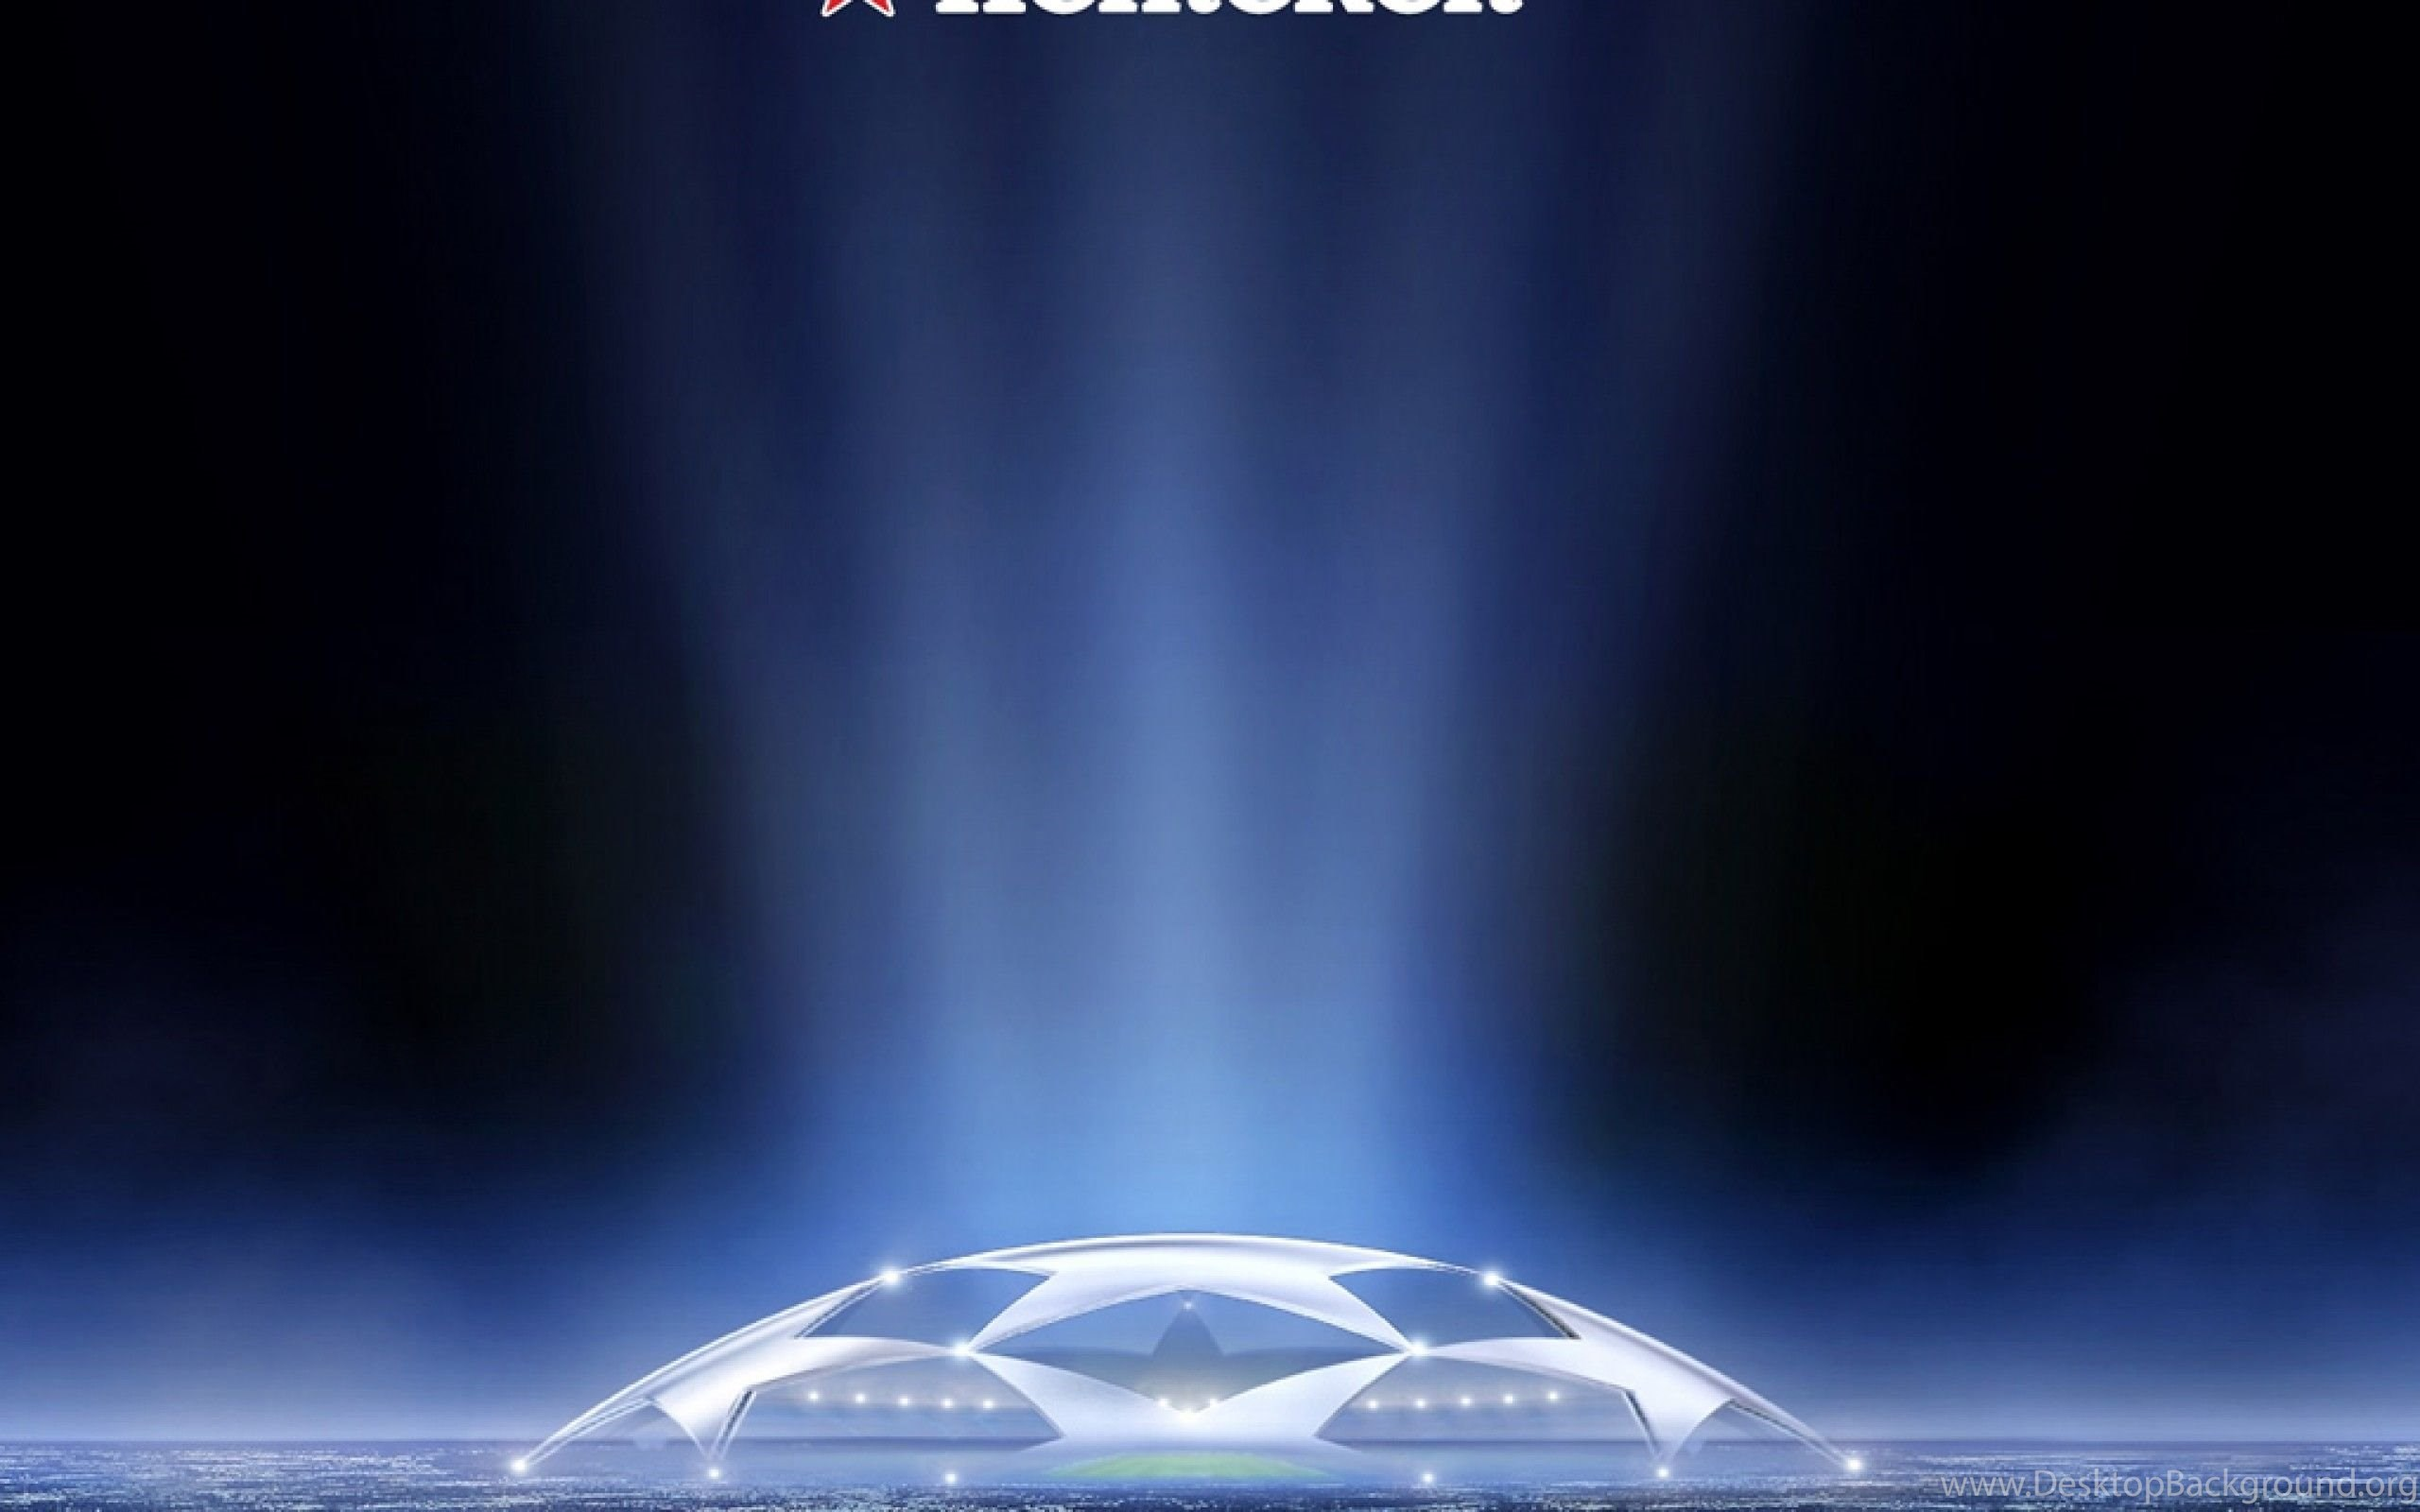 champions league - HD1440×900